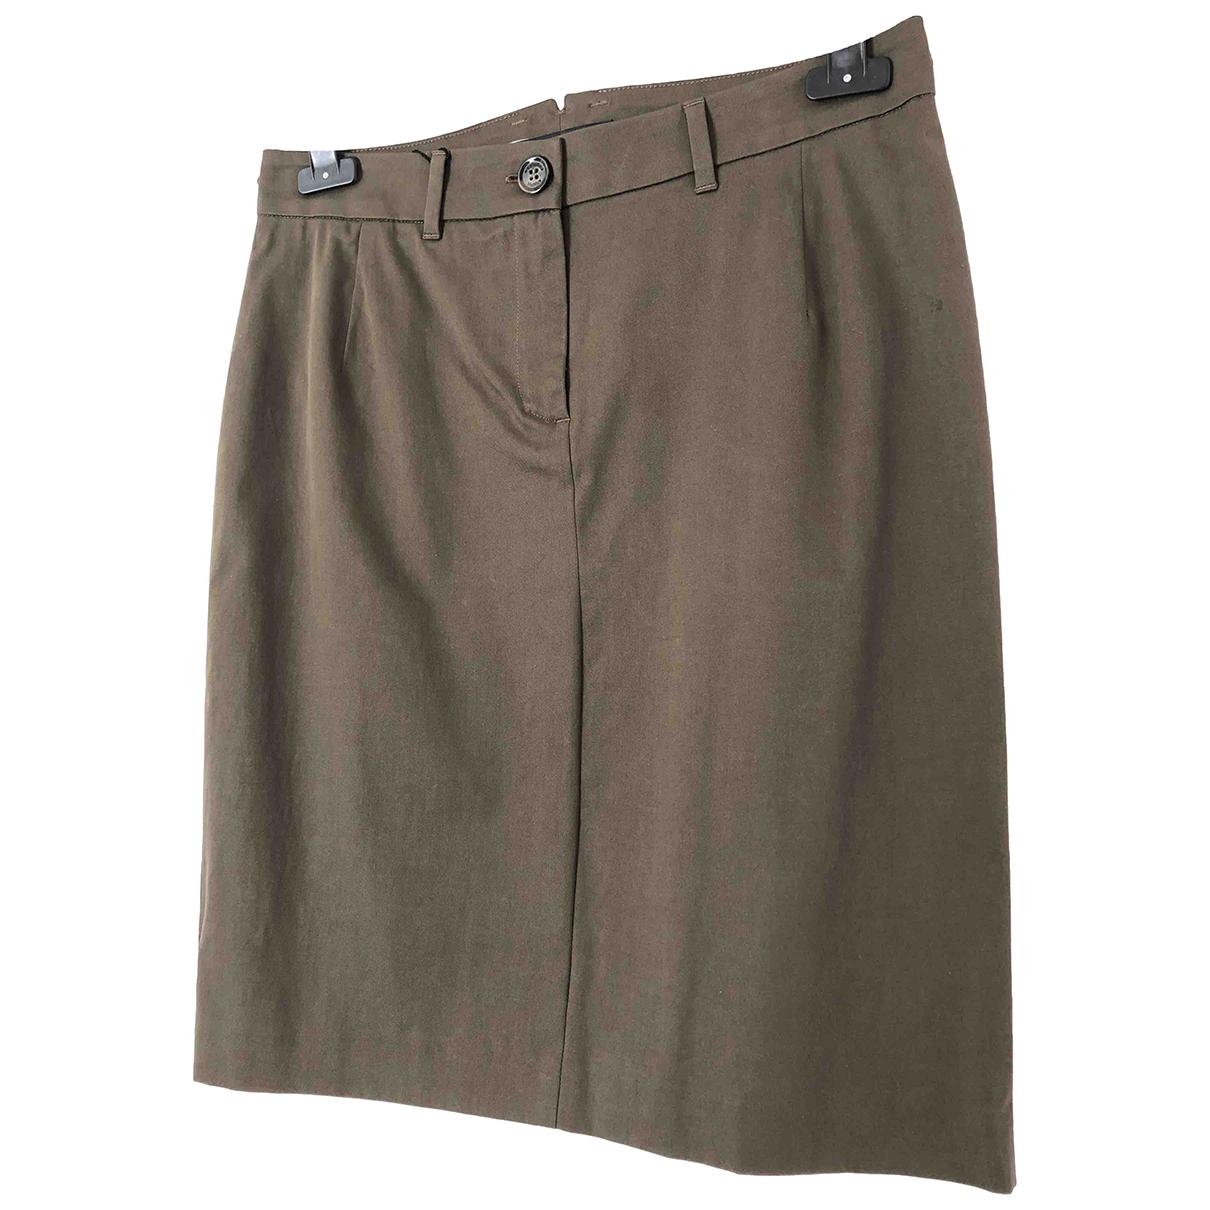 Max Mara Weekend N Khaki Cotton skirt for Women 8 UK